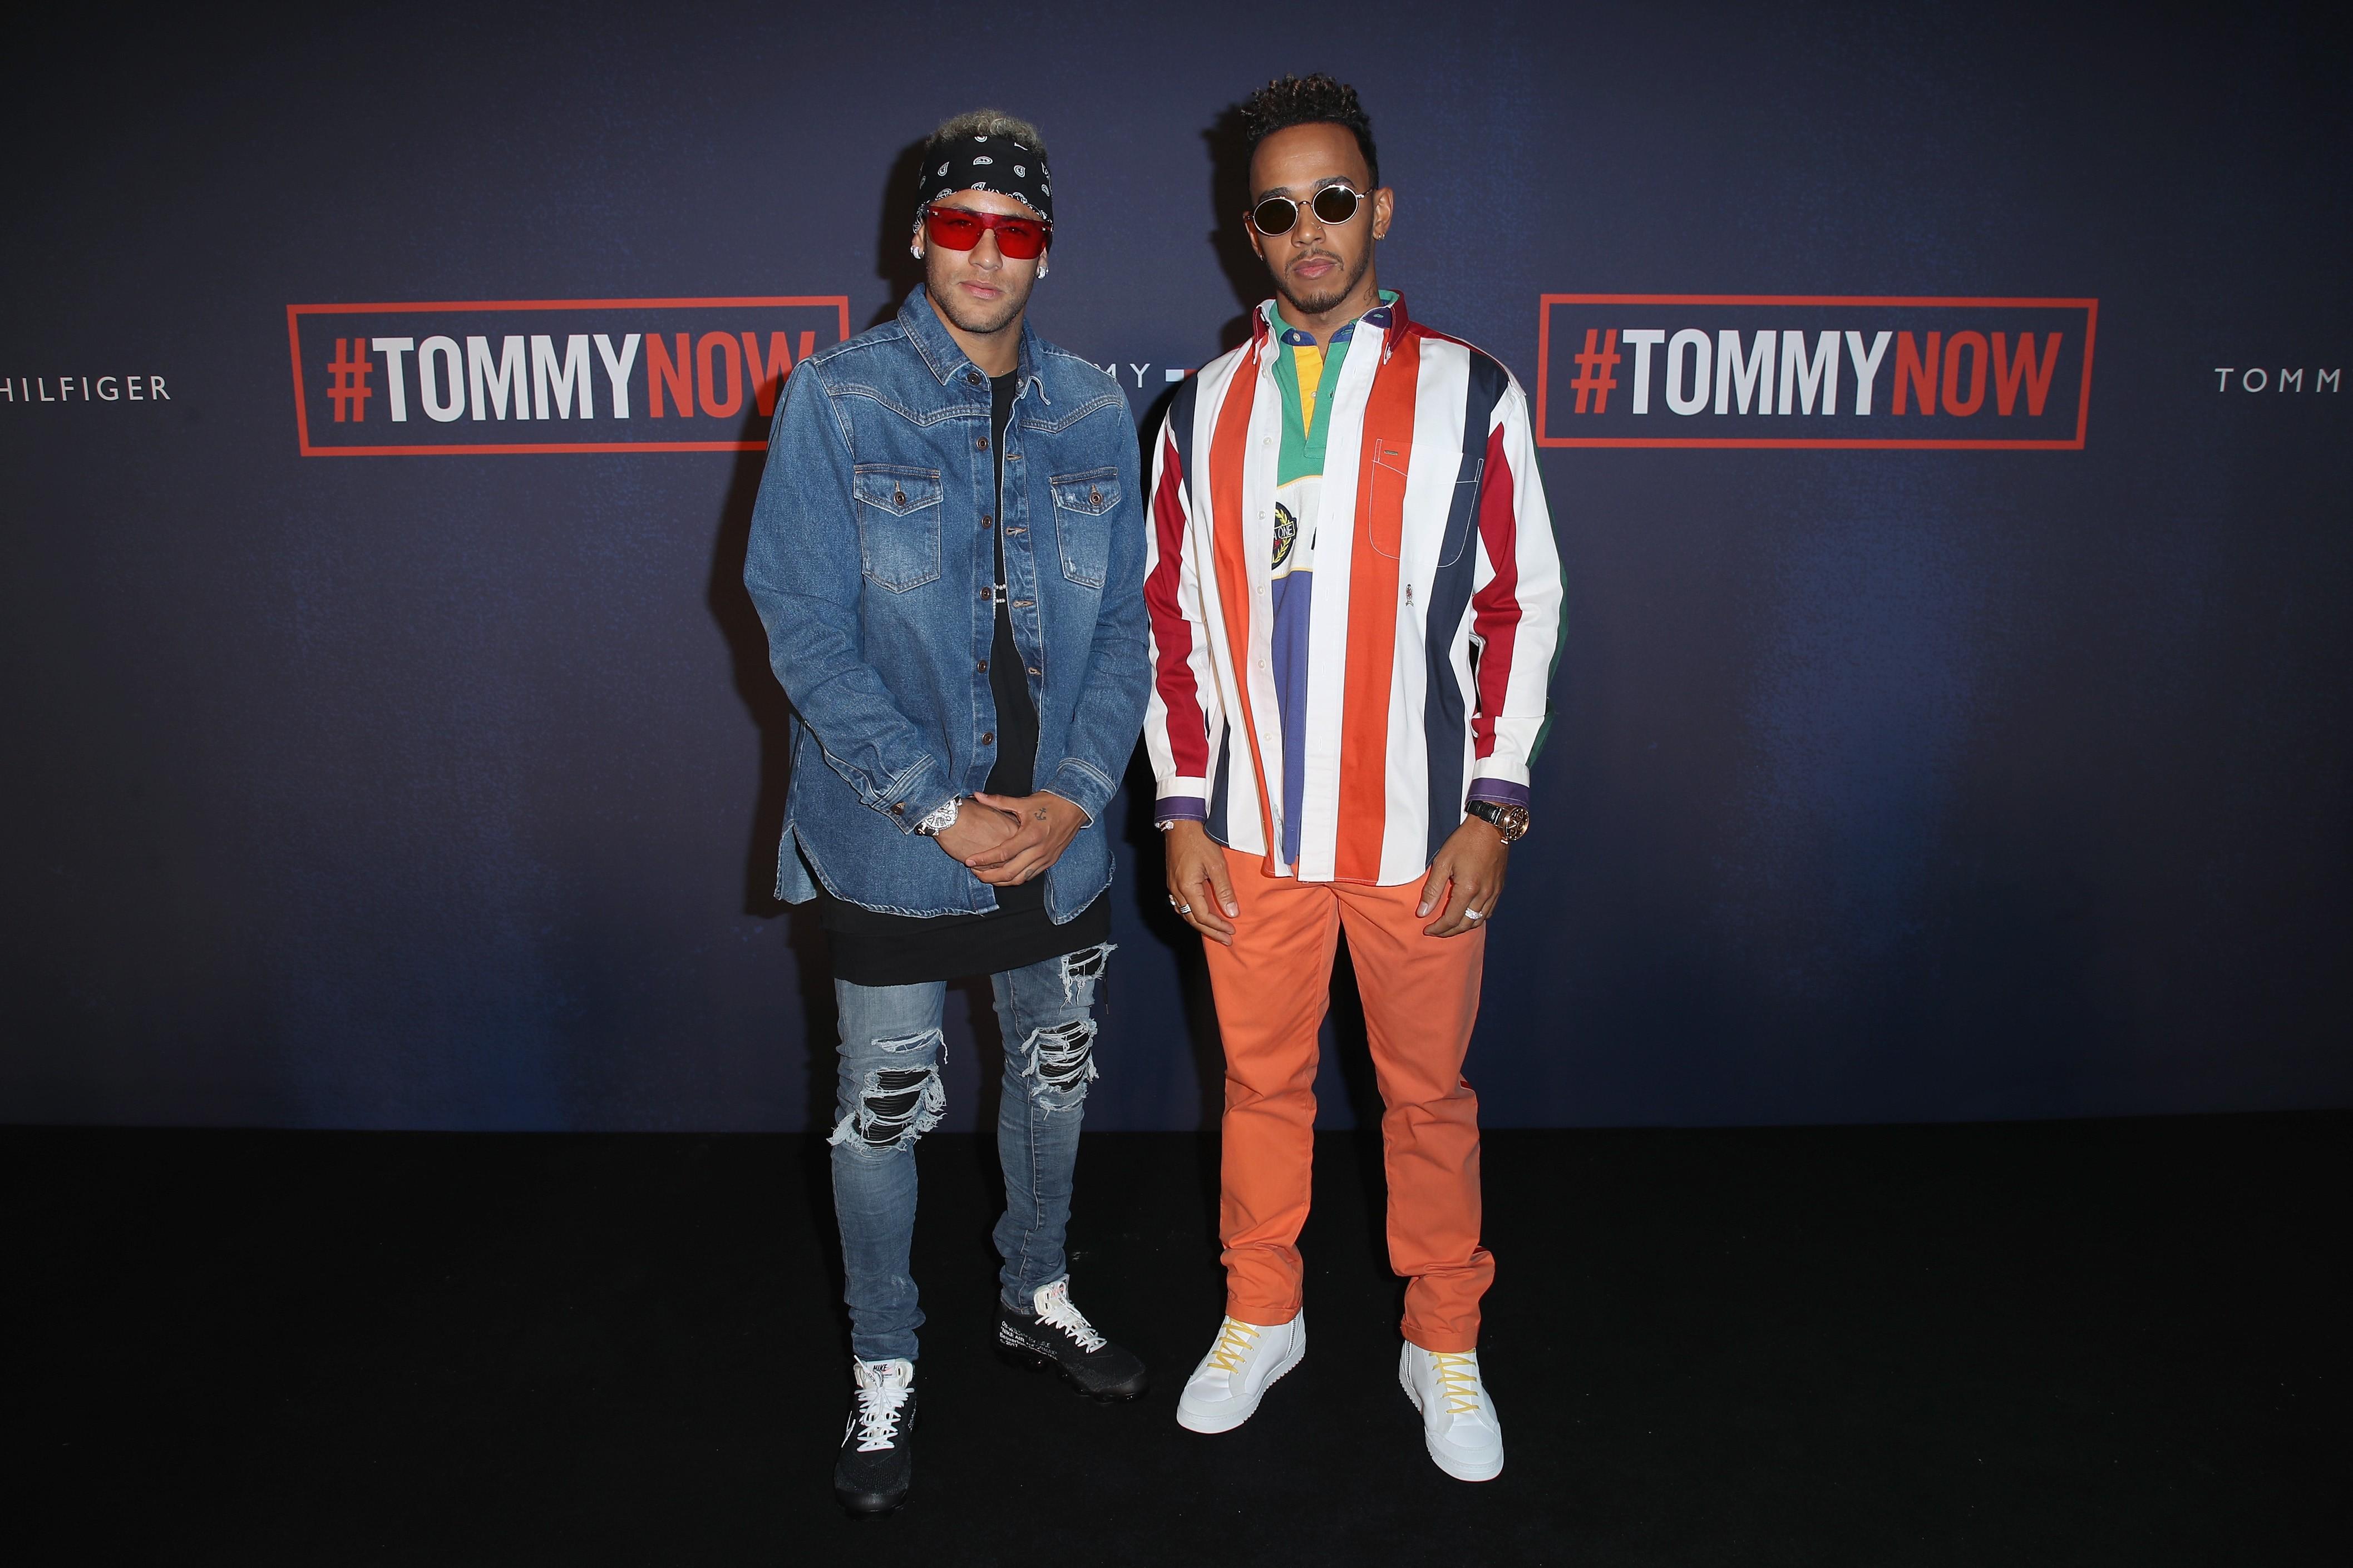 Neymar e Lewis Hamilton no desfile da Tommy Hilfiger (Foto: Mike Marsland/Getty Images)